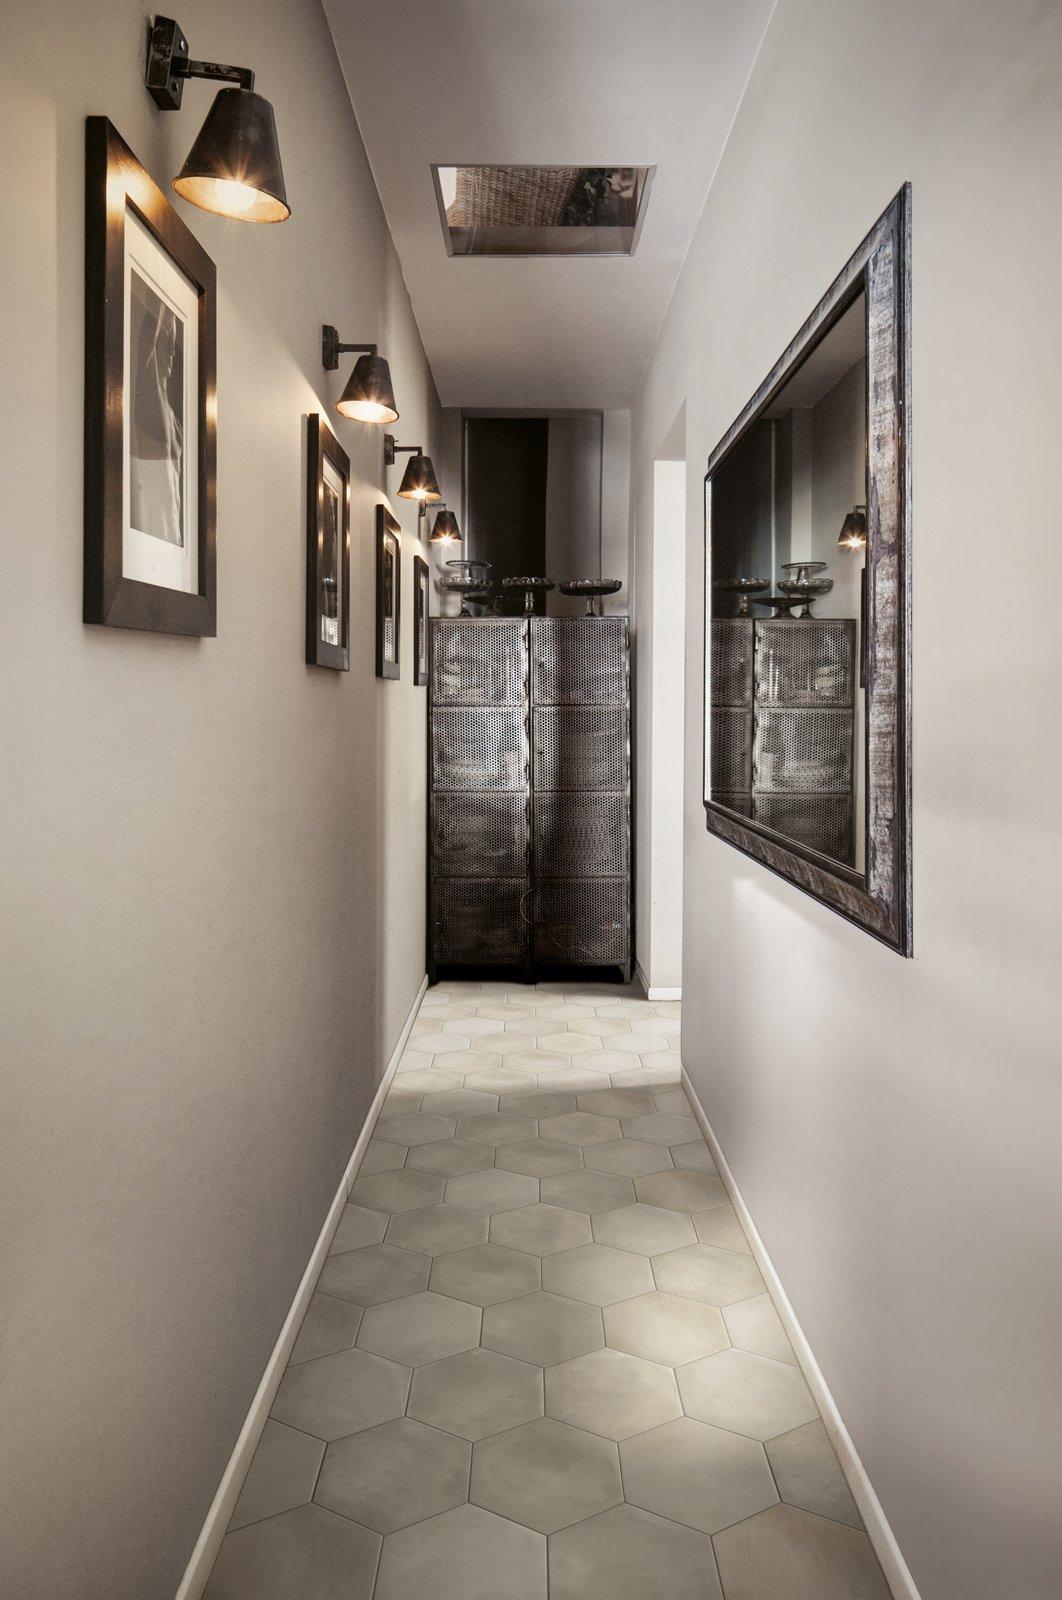 Mattonelle esagonali pavimenti nh69 regardsdefemmes - Piastrelle bagno firenze ...